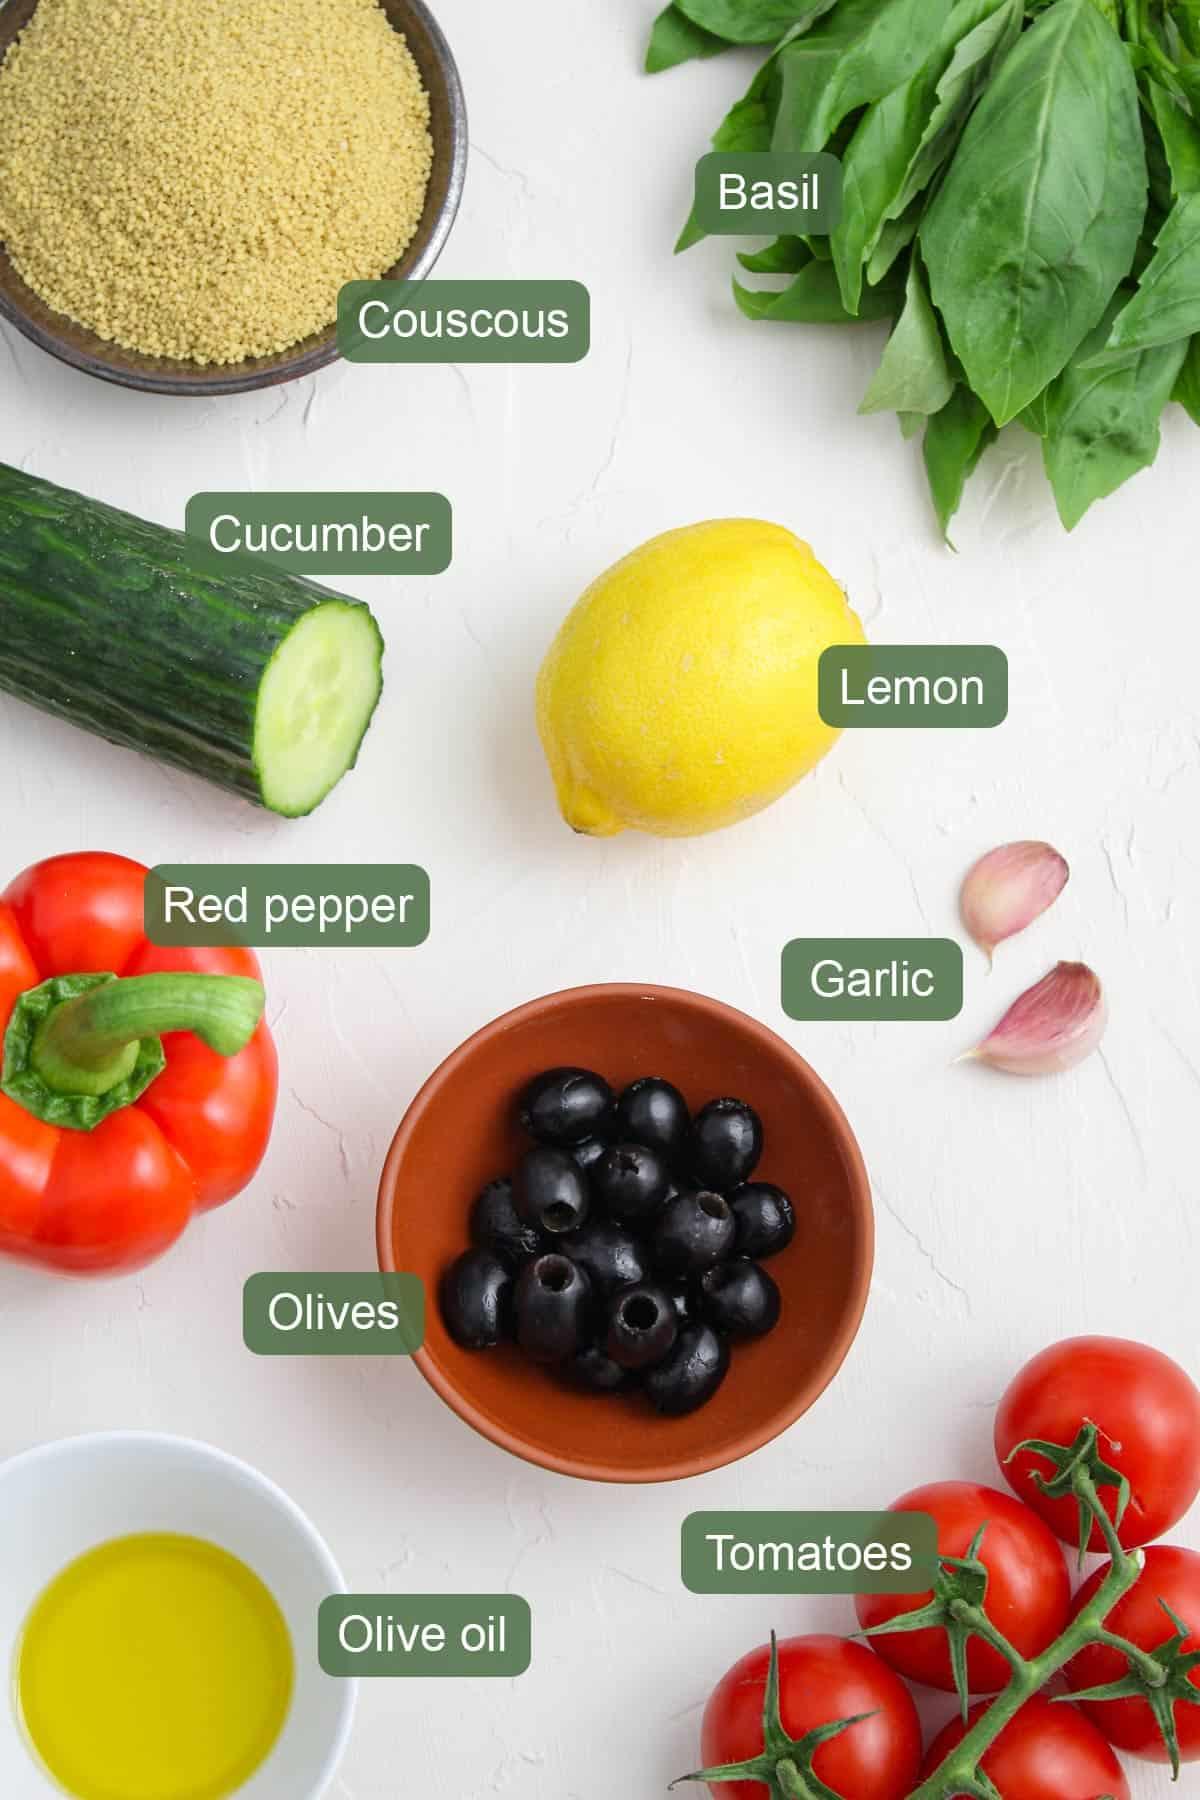 List of Ingredients To Make Vegan Couscous Salad